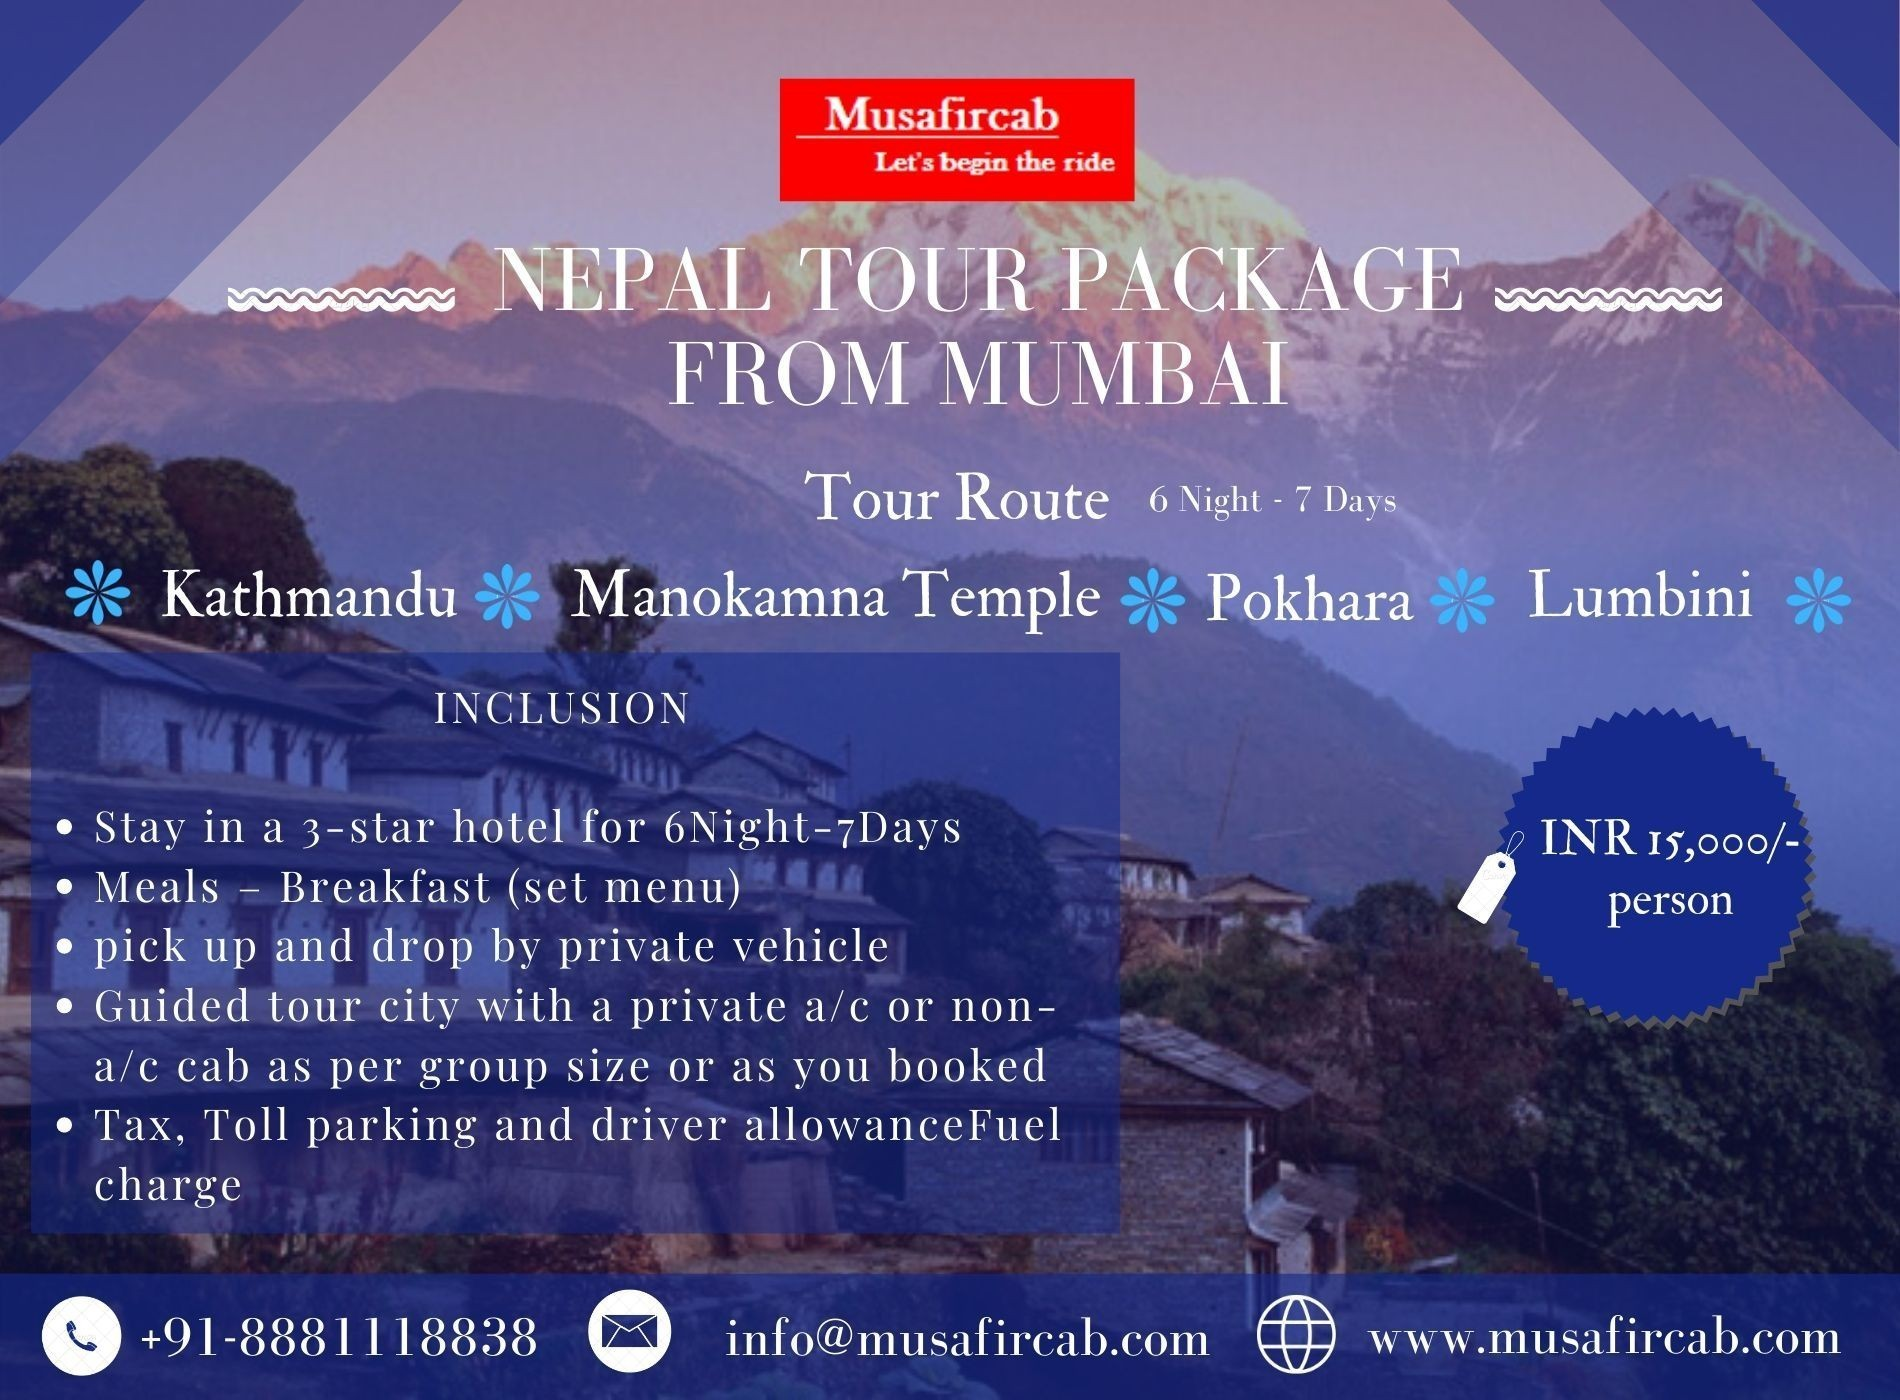 Nepal Tour Package From Mumbai